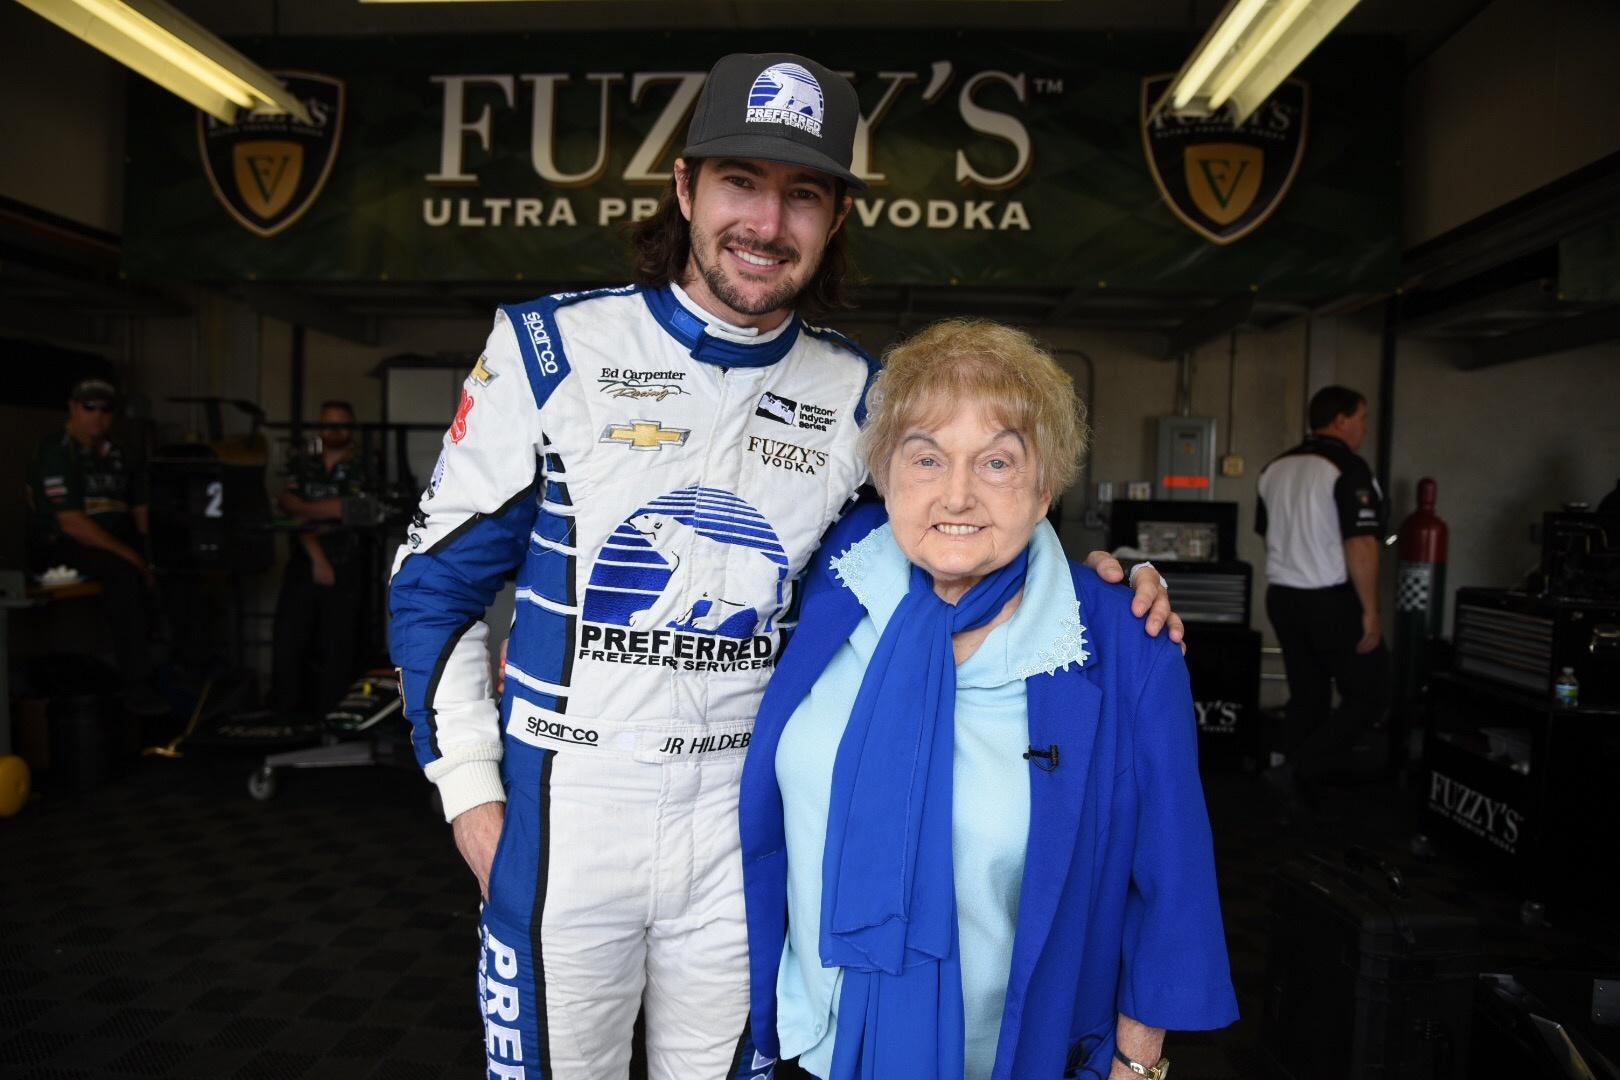 Eva Kor with Indianapolis 500 driver JR Hildebrand.